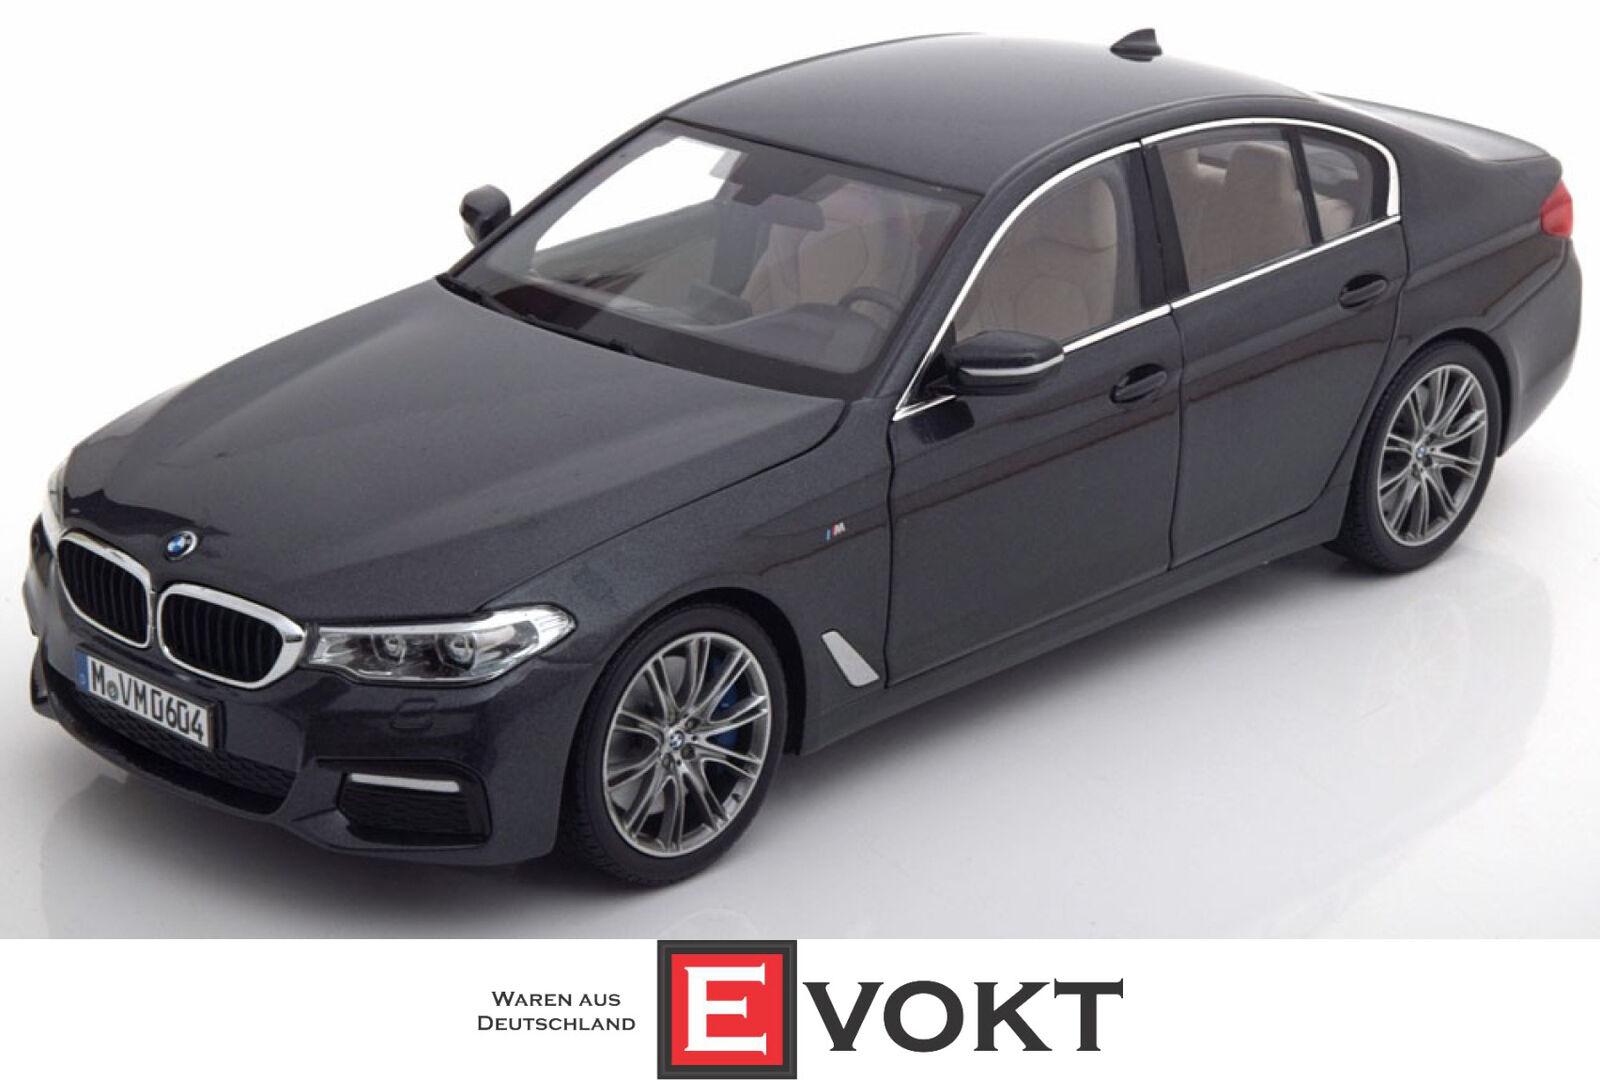 Original BMW 5er G30 grigio Sophisto Saloon en miniatura 1 18 Kyosho Modelo de Coche